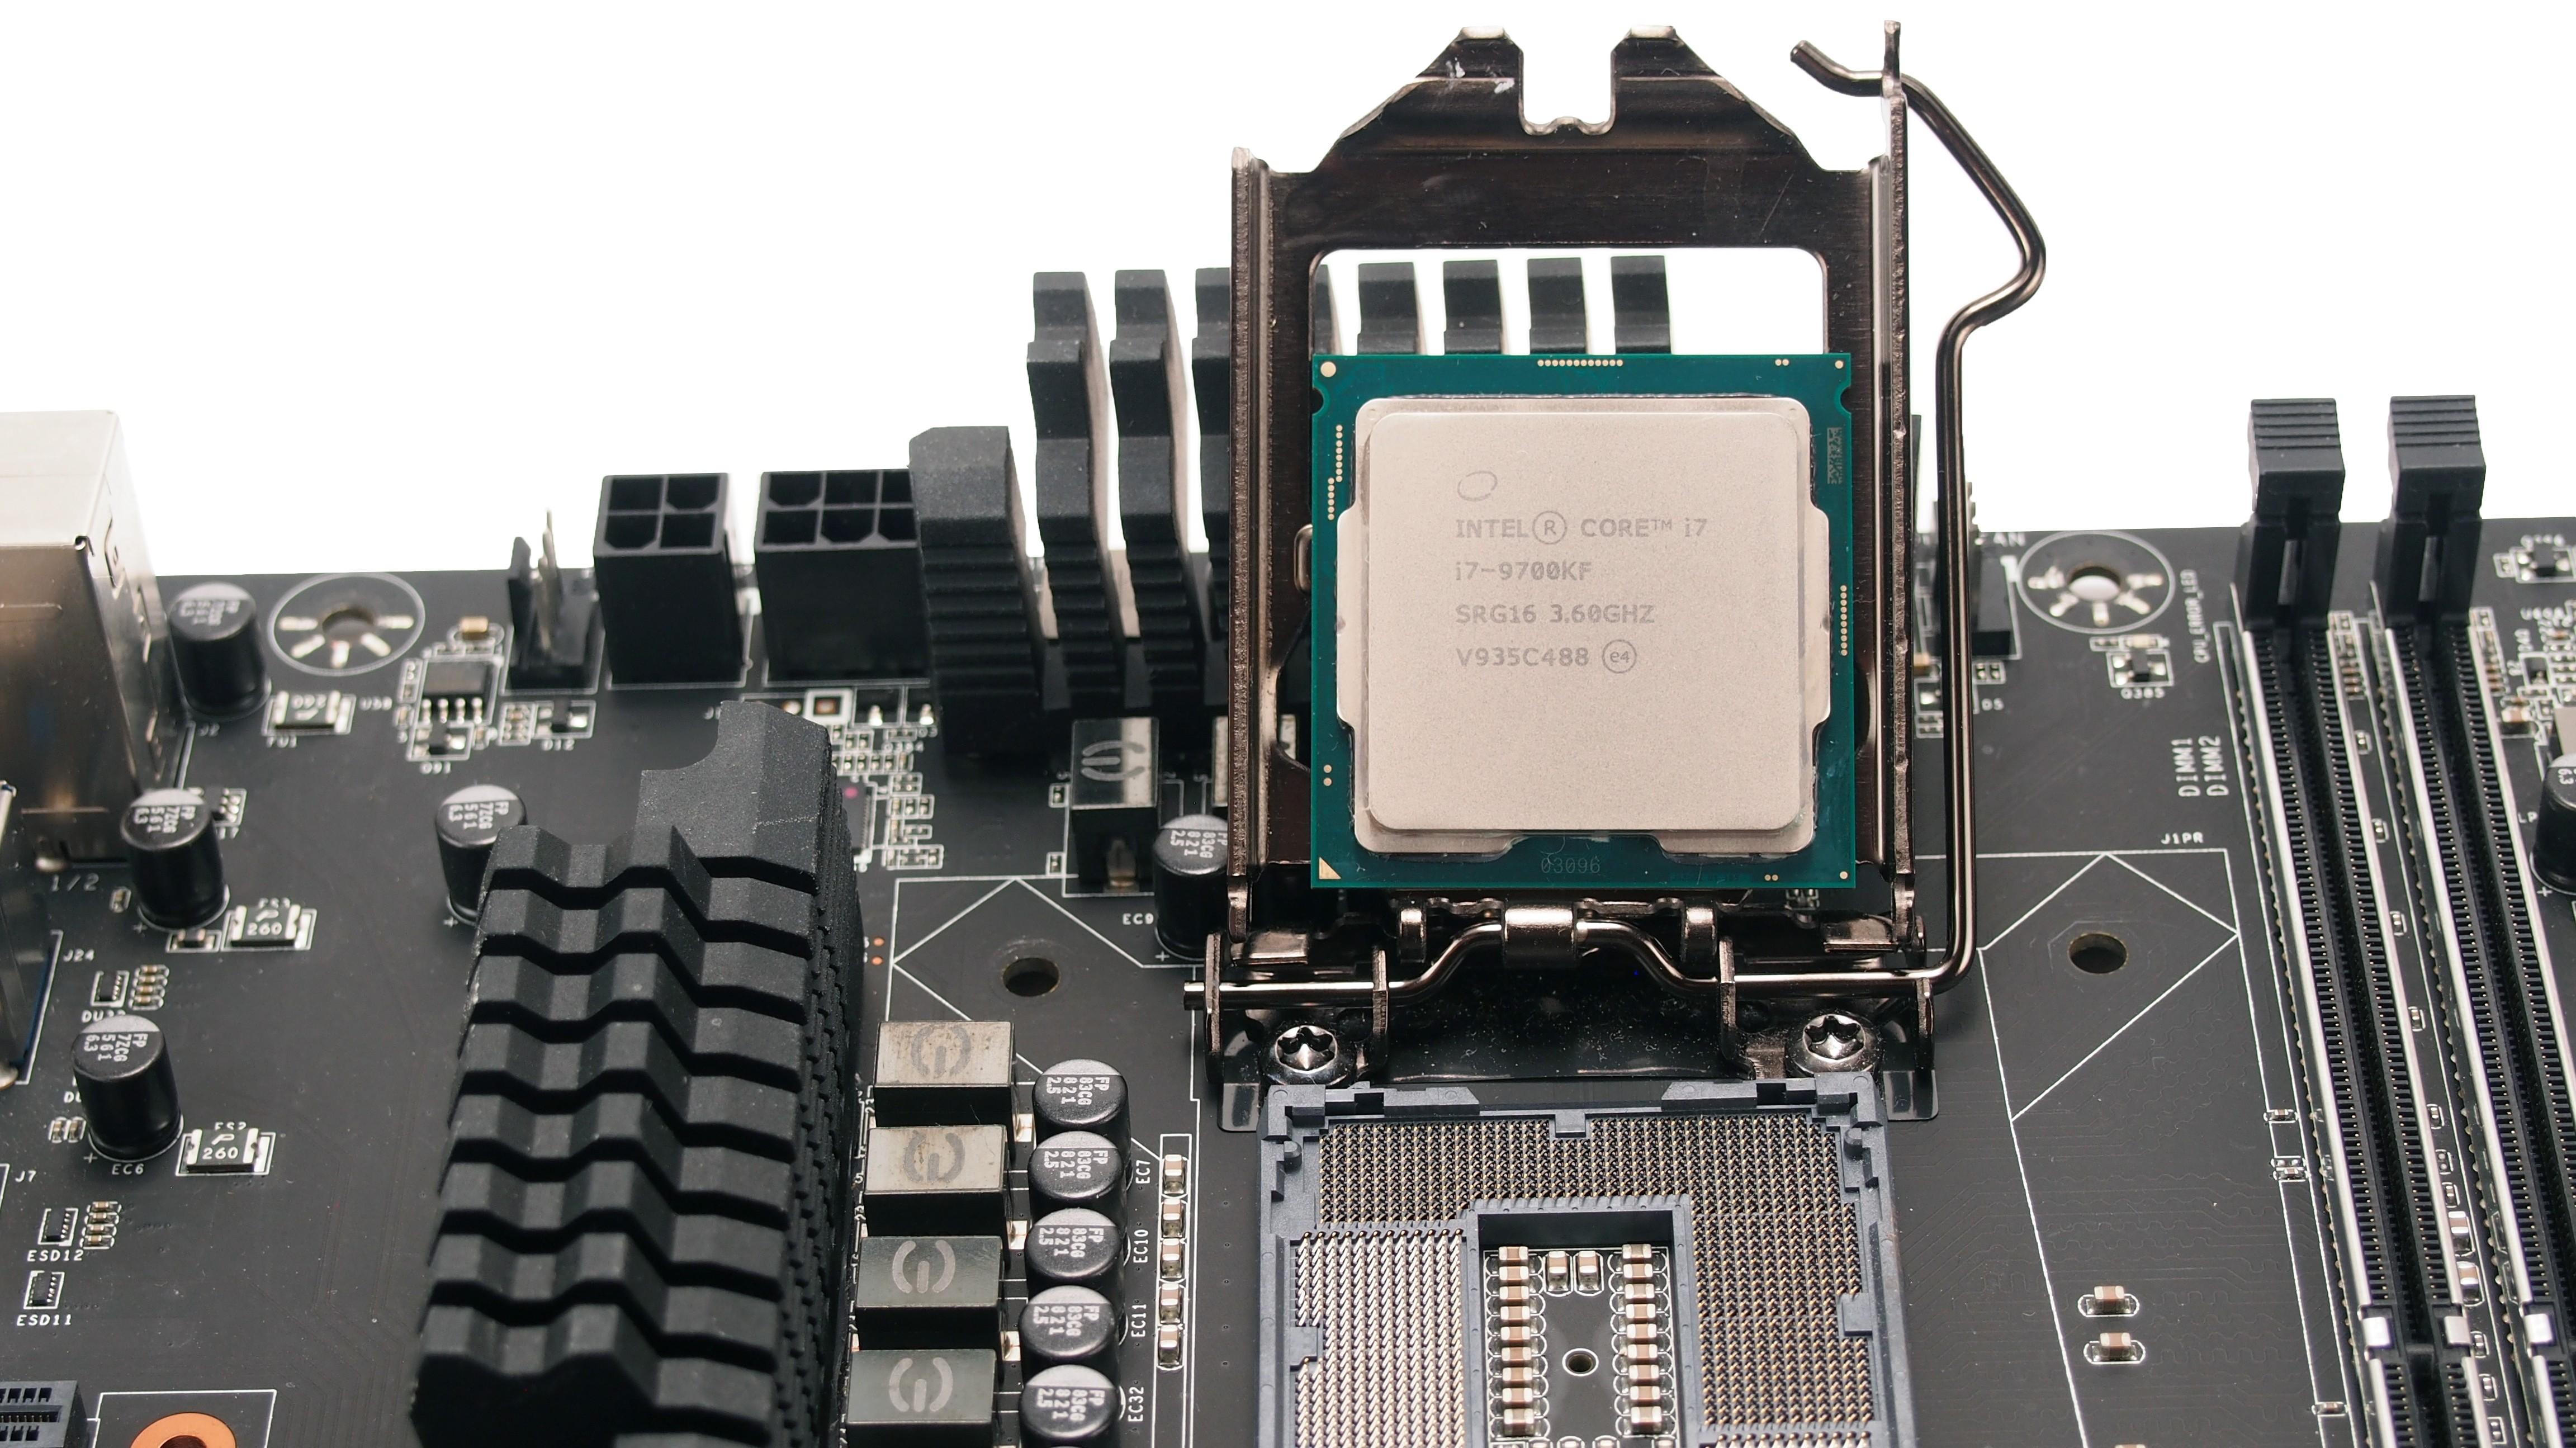 Обзор и тест процессора Intel Core i7-9700KF